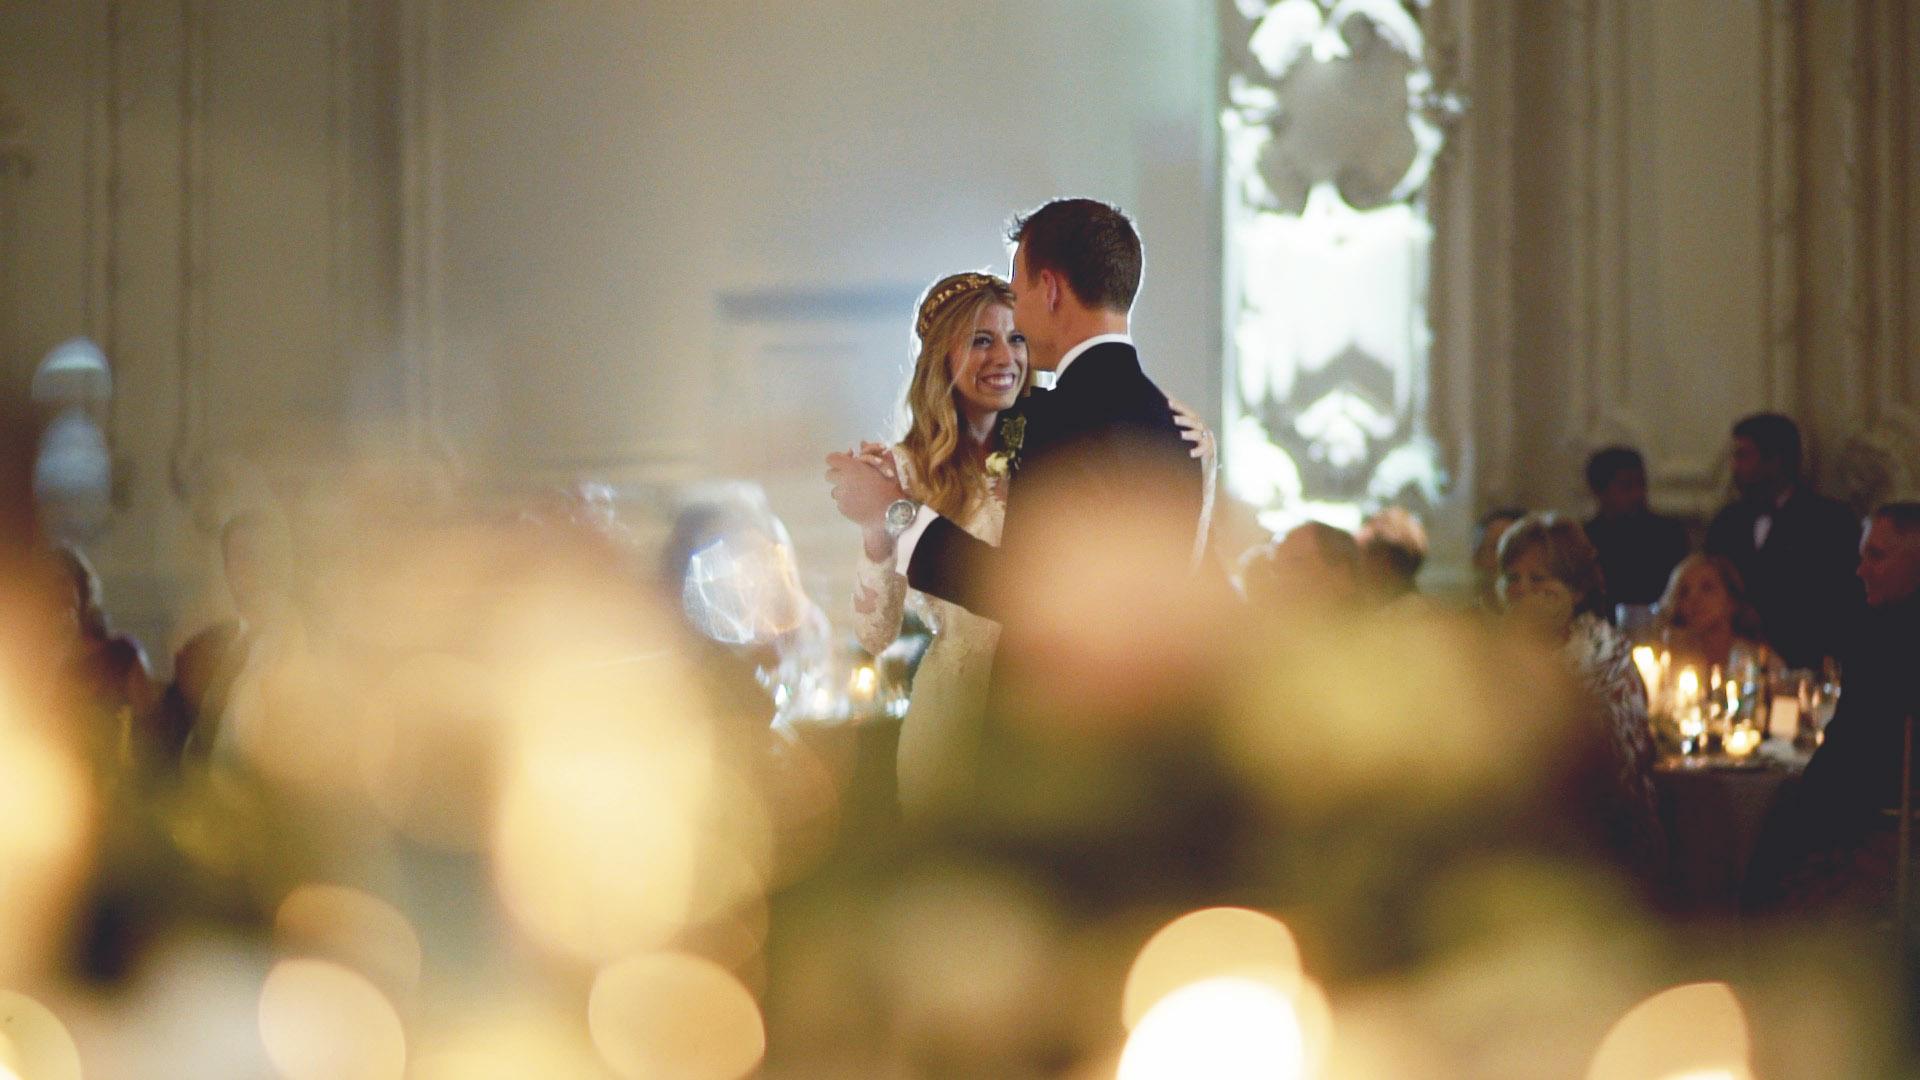 Wedding CInematography Toronto King Edward Hotel St. Michaels Cathedral